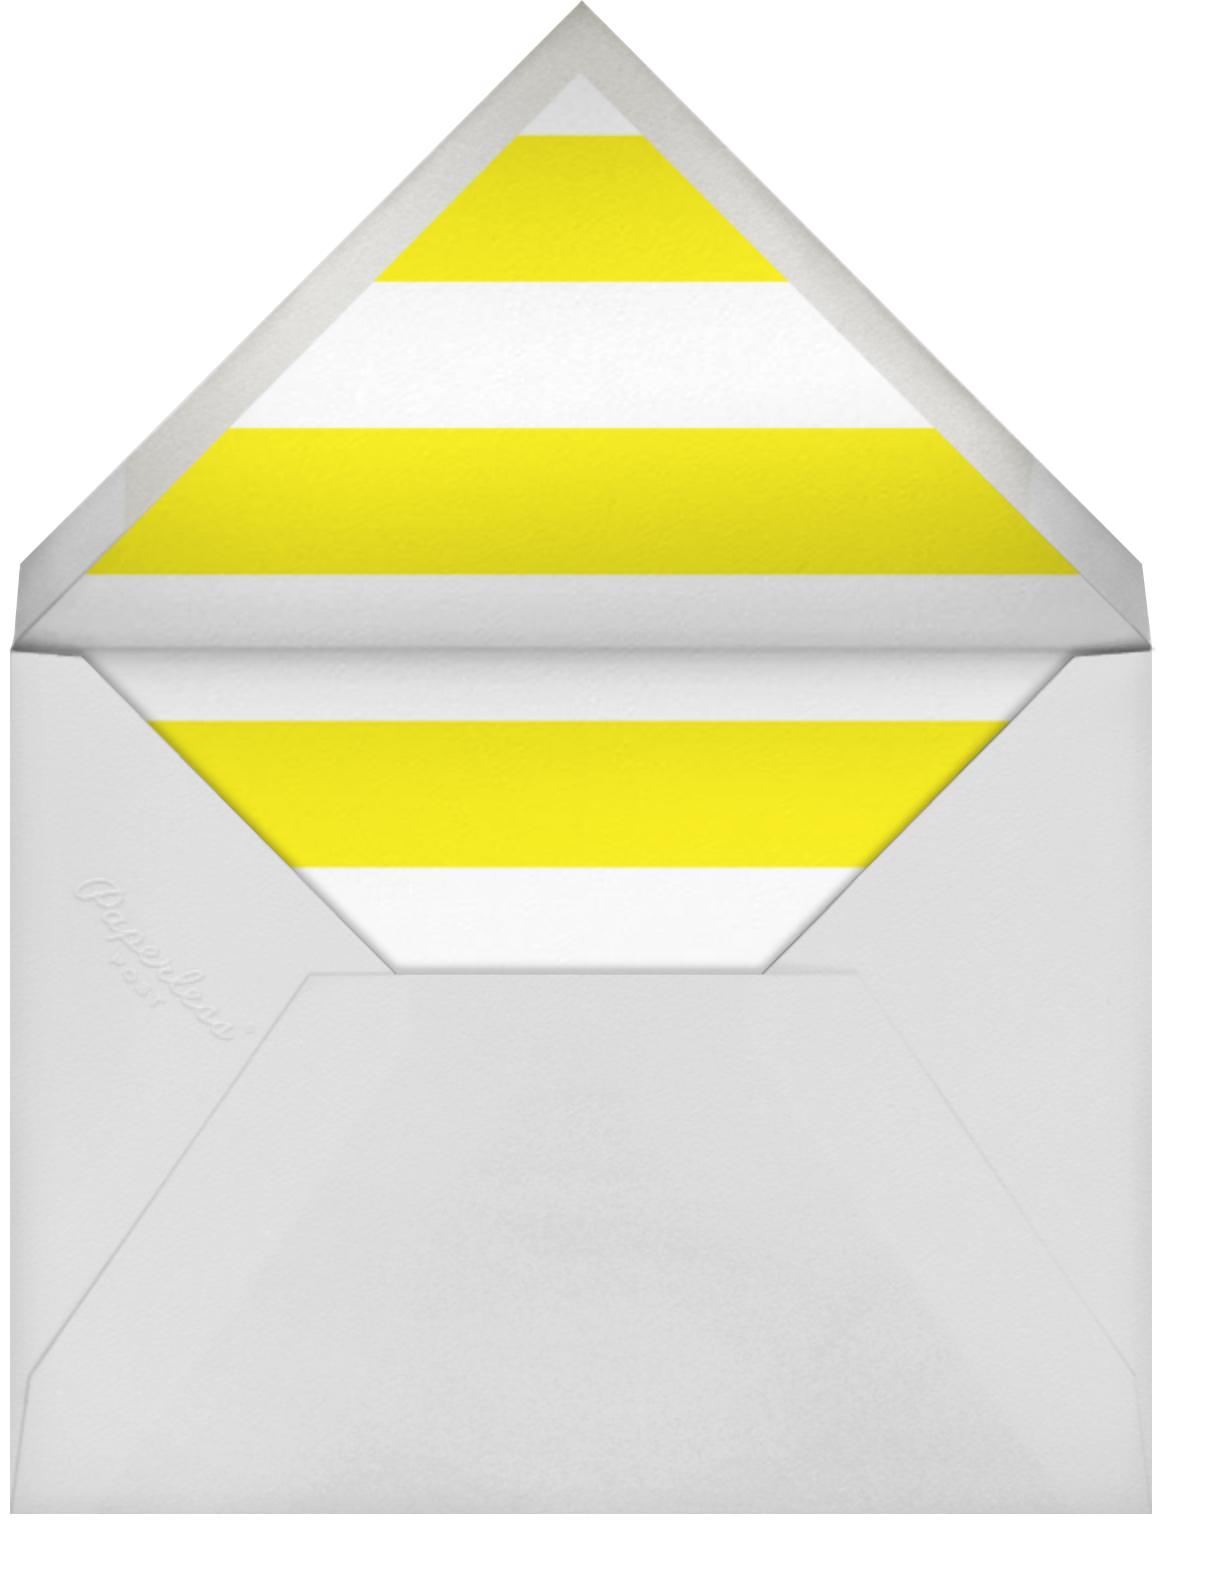 Balloon Birthday (Photo) - Yellow - kate spade new york - Kids' birthday - envelope back